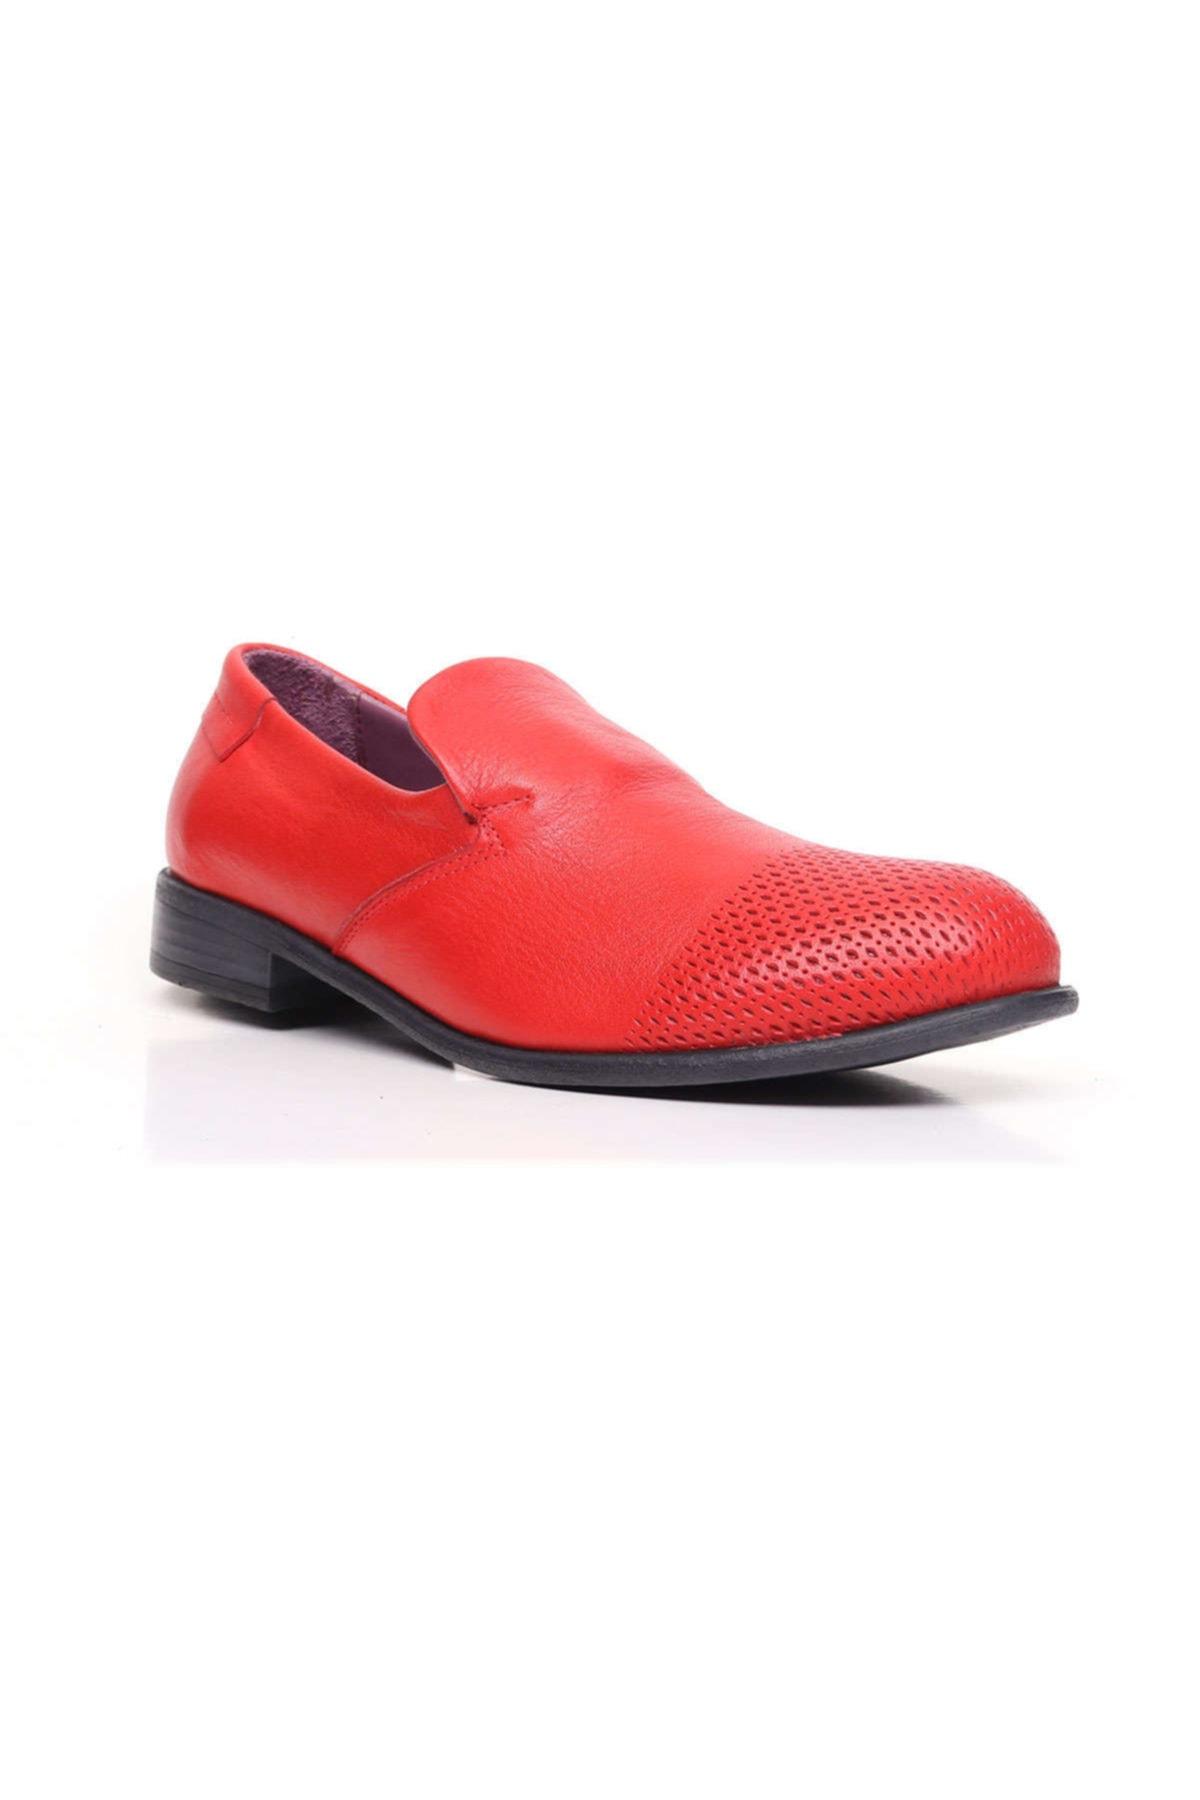 BUENO Shoes  Kadın Ayakkabı 9p1700 1